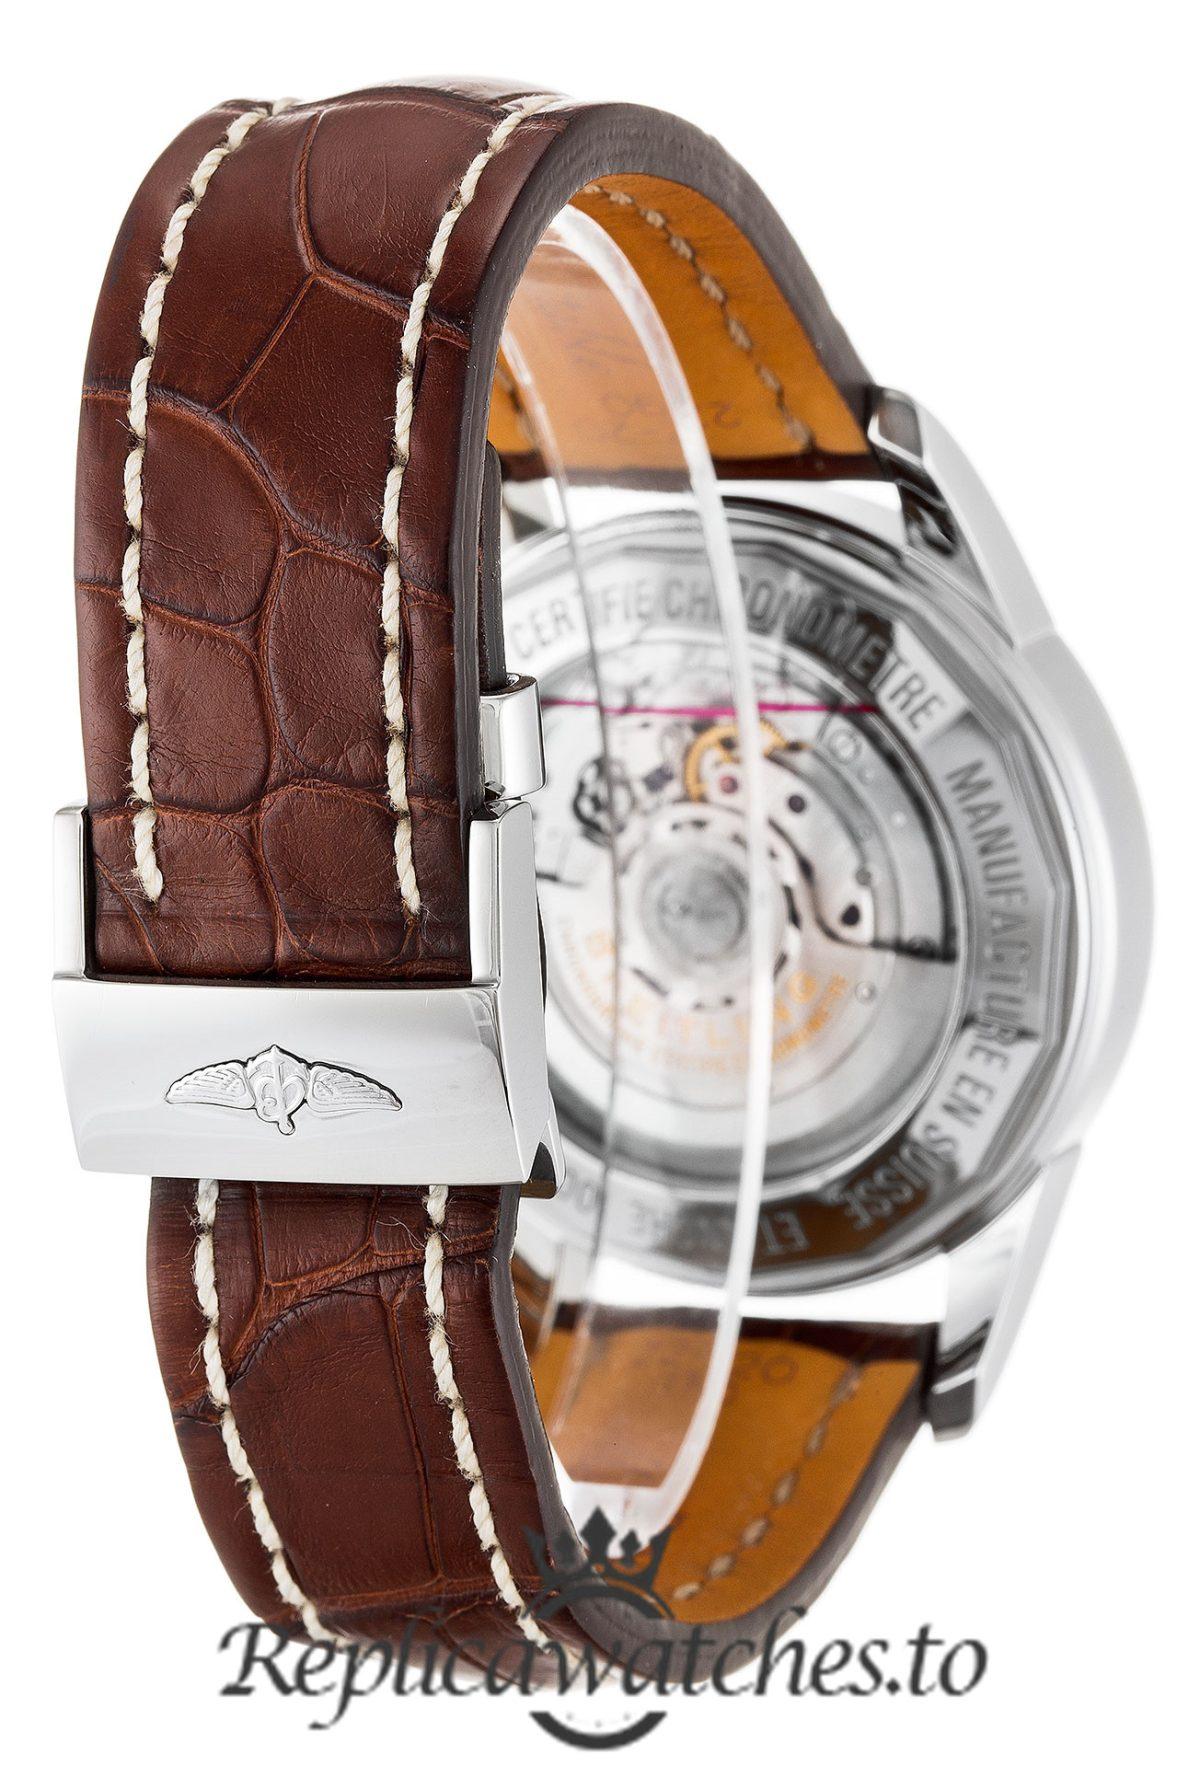 Breitling Transocean Chronograph Replica AB0152 002 Black Dial 43MM